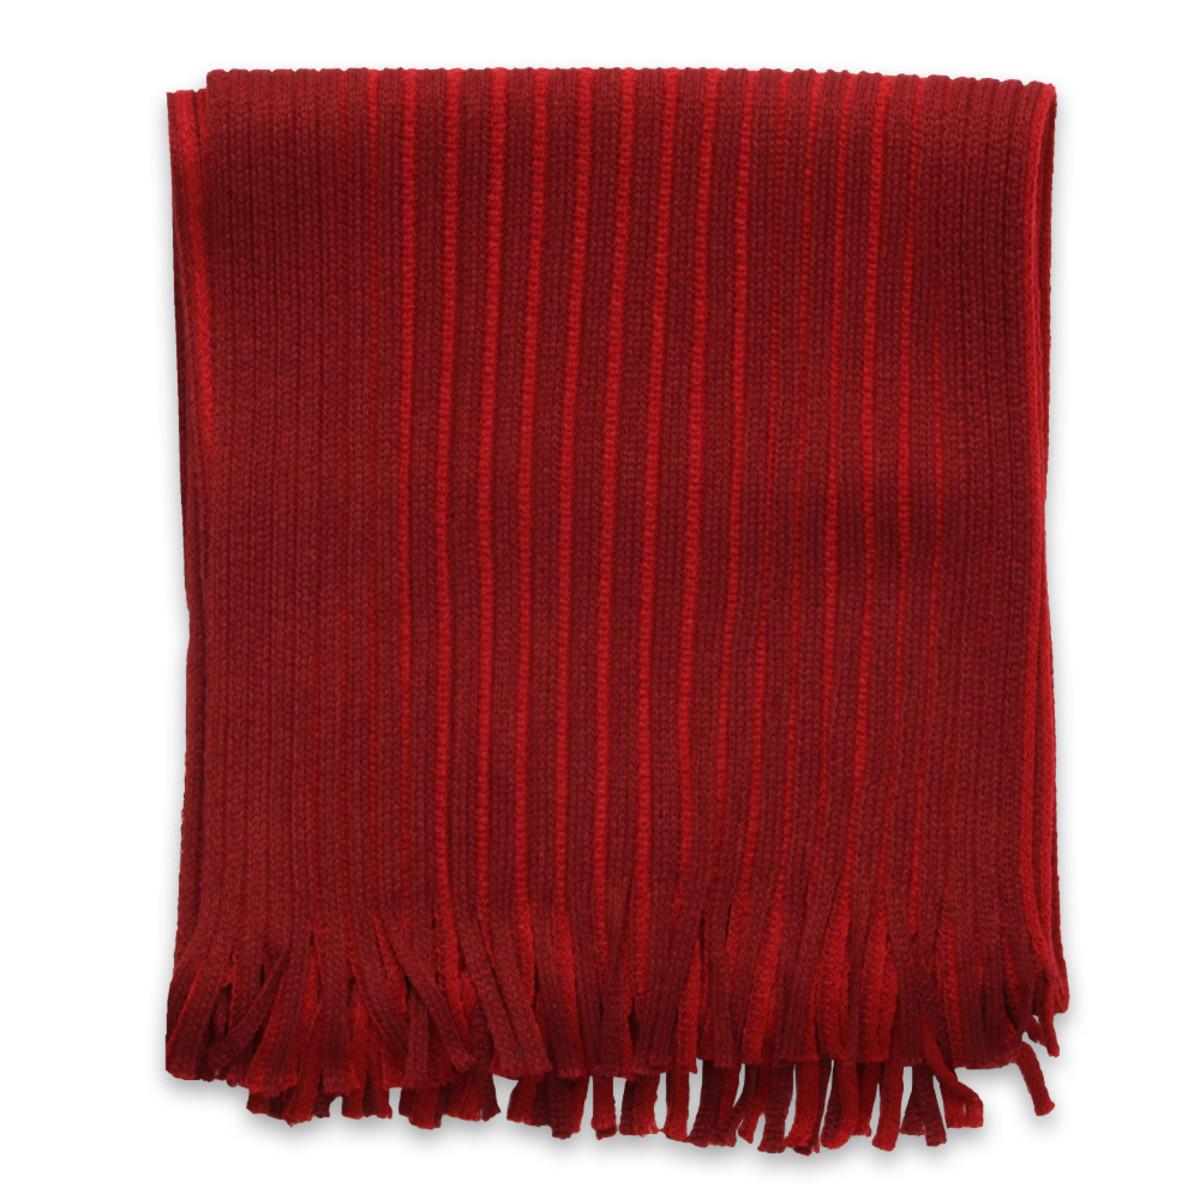 050021b87f0 Šála bordó-červené barvy s proužkem 9963 - Willsoor